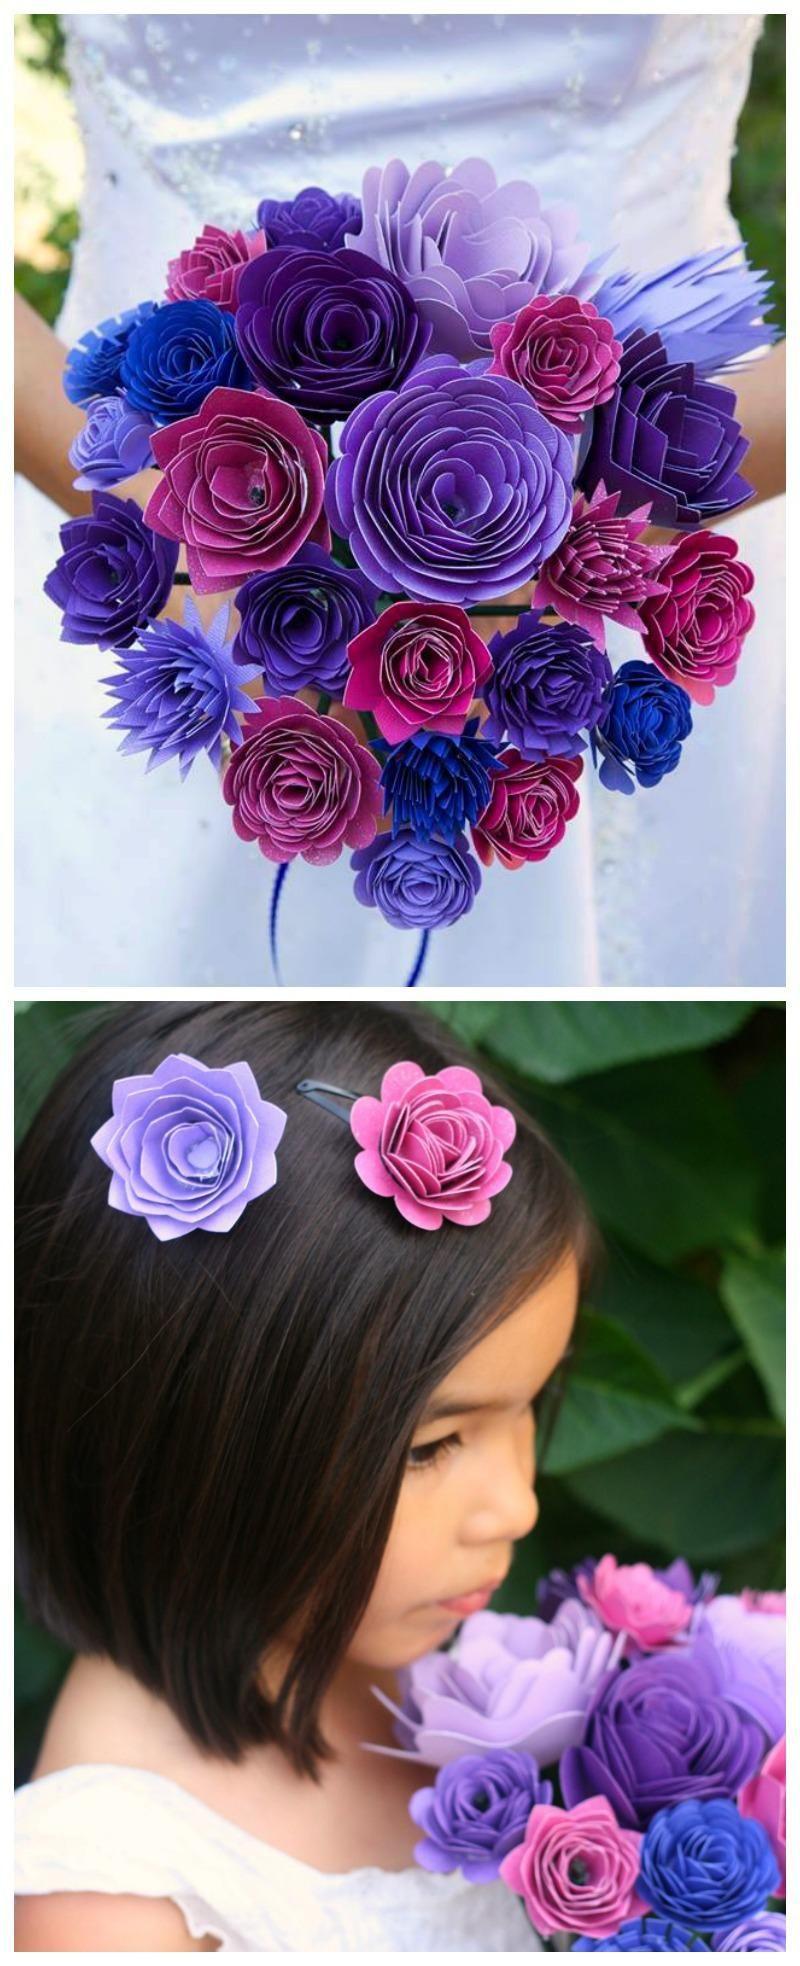 Diy Wedding Diy Paper Wedding Bouquet And Matching Flower Girl